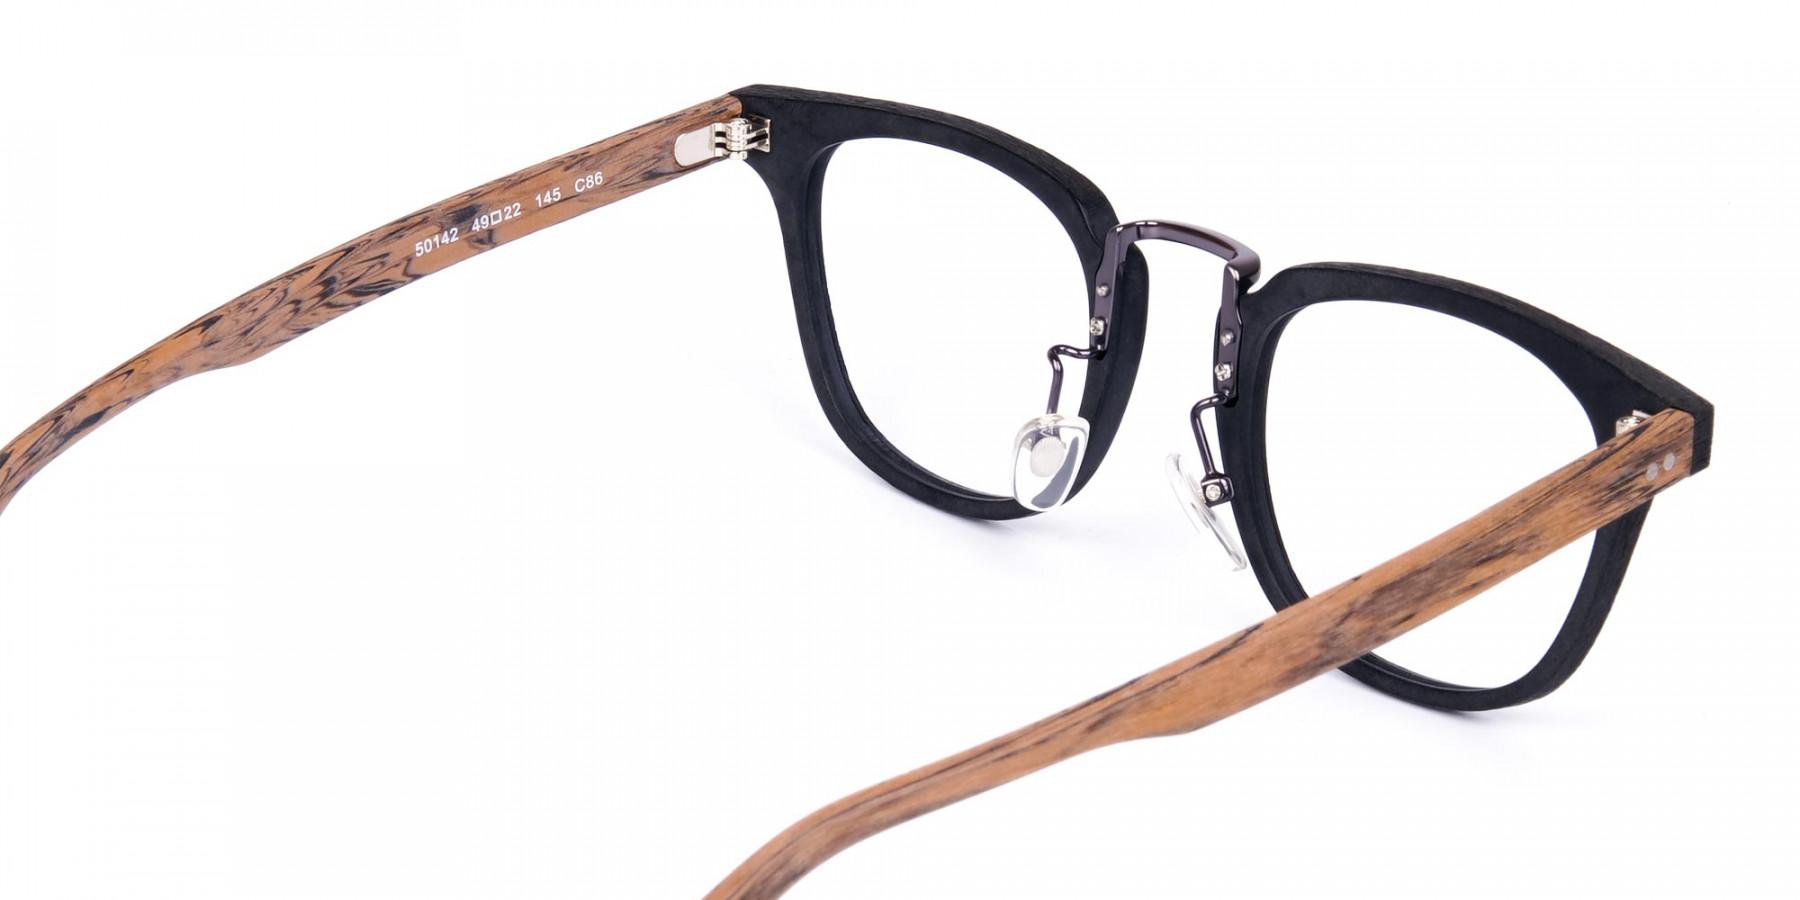 Brown-and-Black-Full-Rim-Wooden-Glasses-1